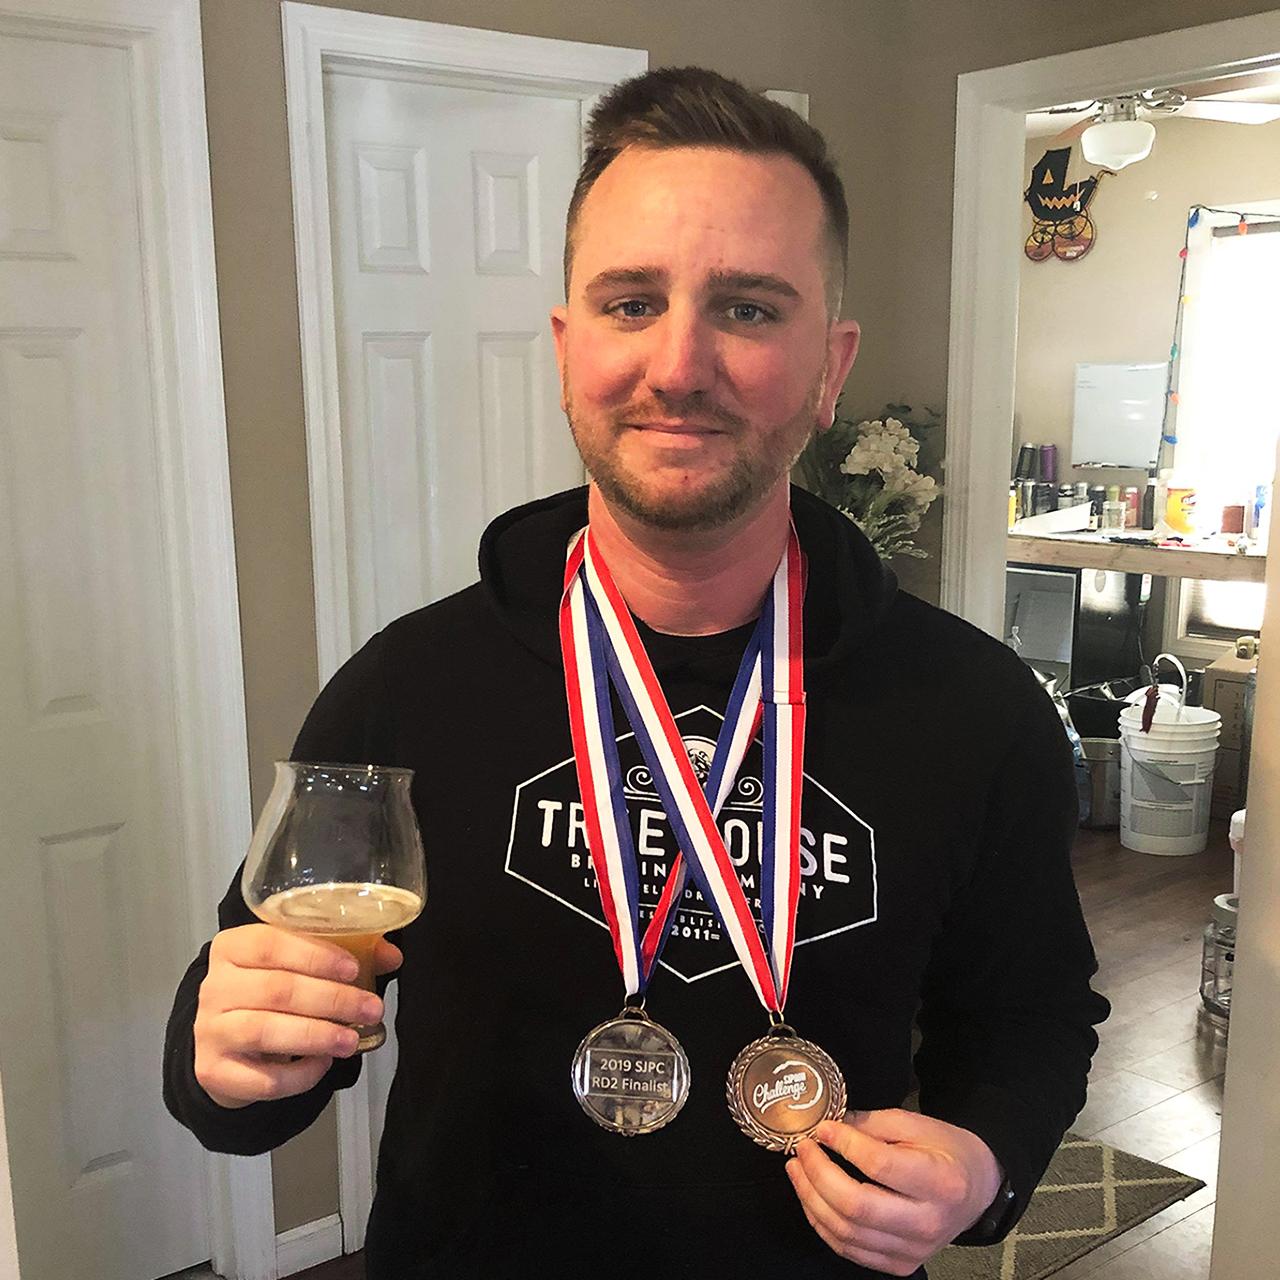 2019 SJPC 3rd place Jeff Neville